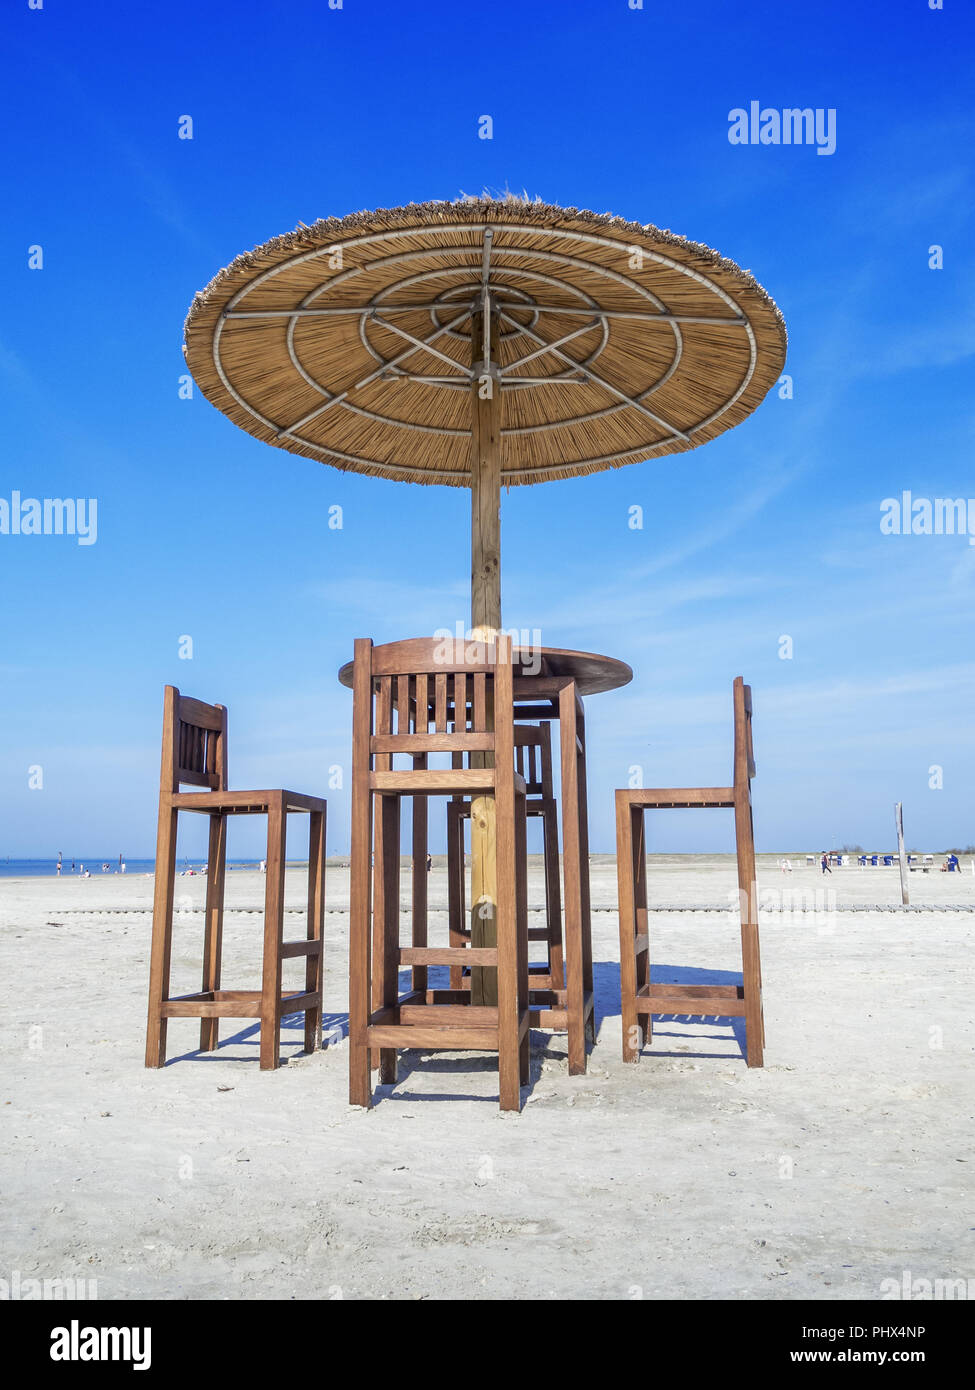 Beach Bar Table With Umbrella Stock Photo 217548066 Alamy